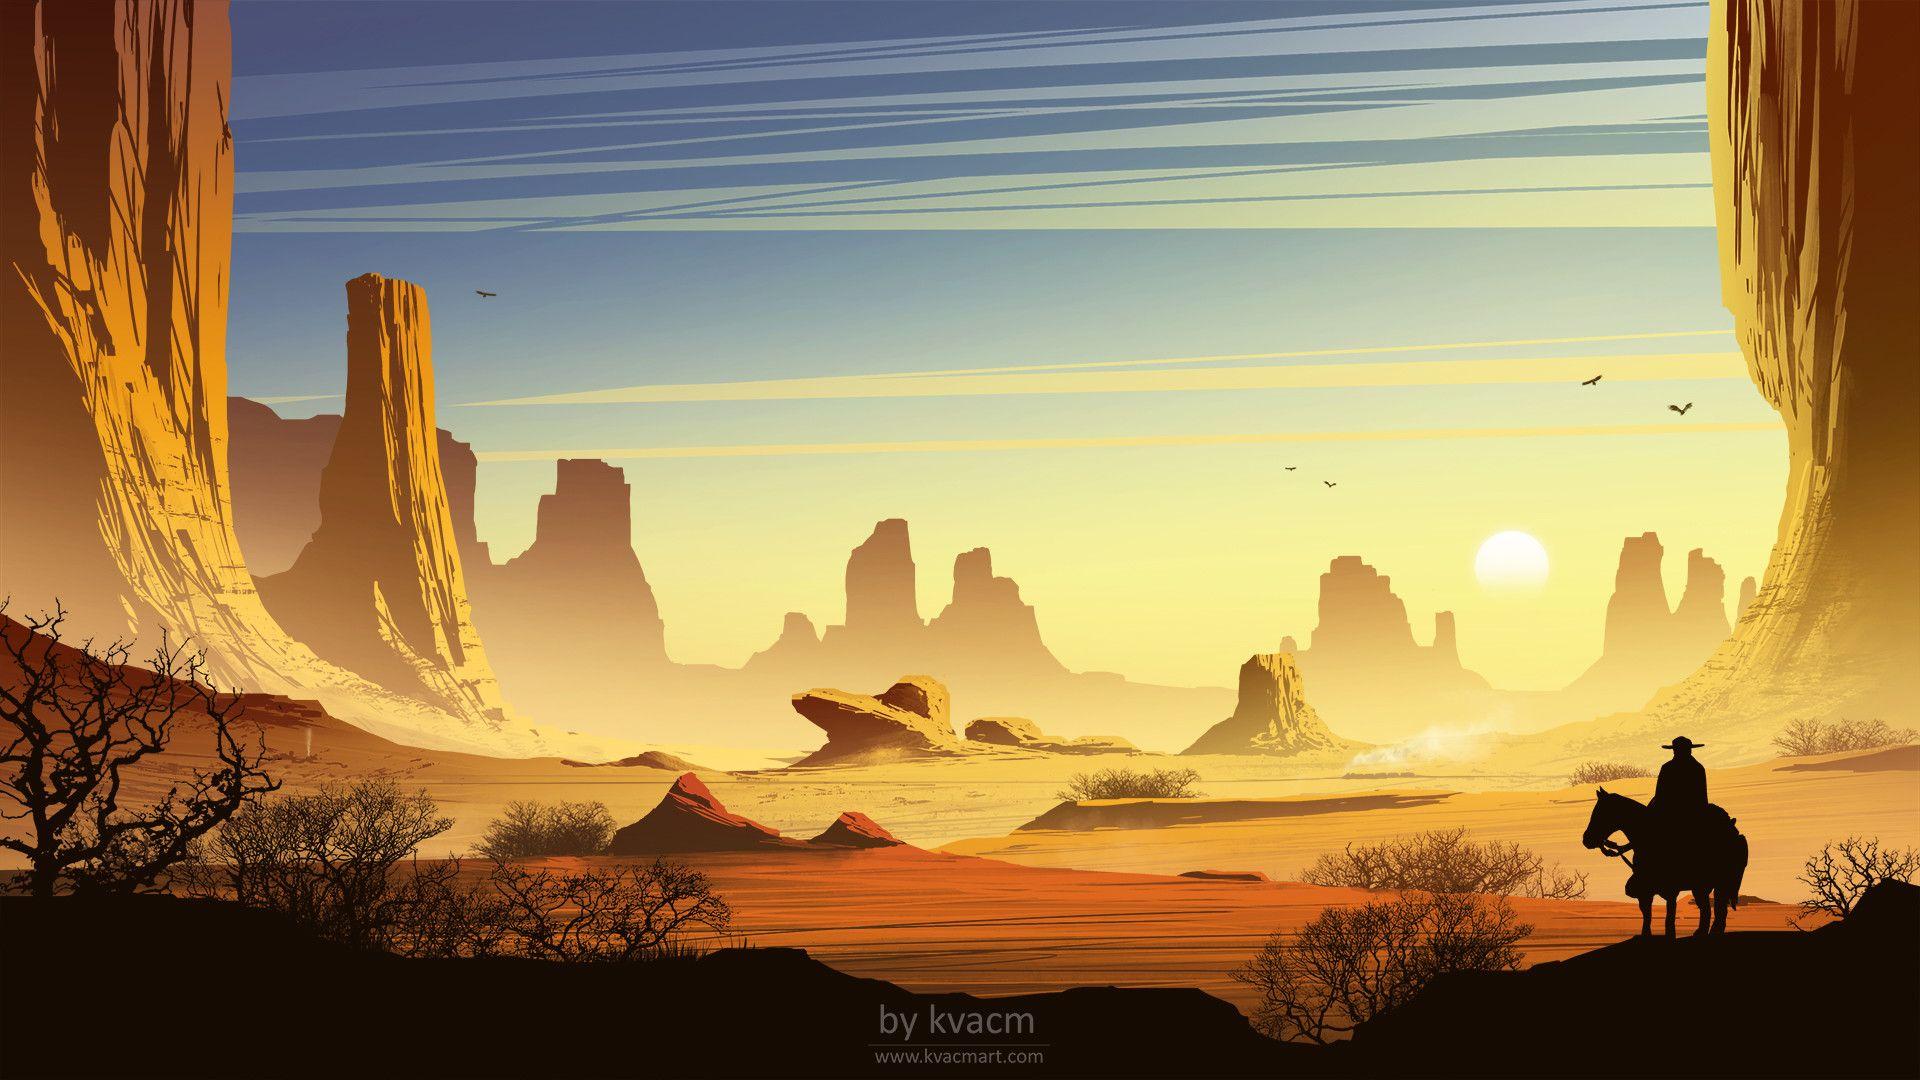 Wild West by Michal Kváč Digital art anime, Fantasy